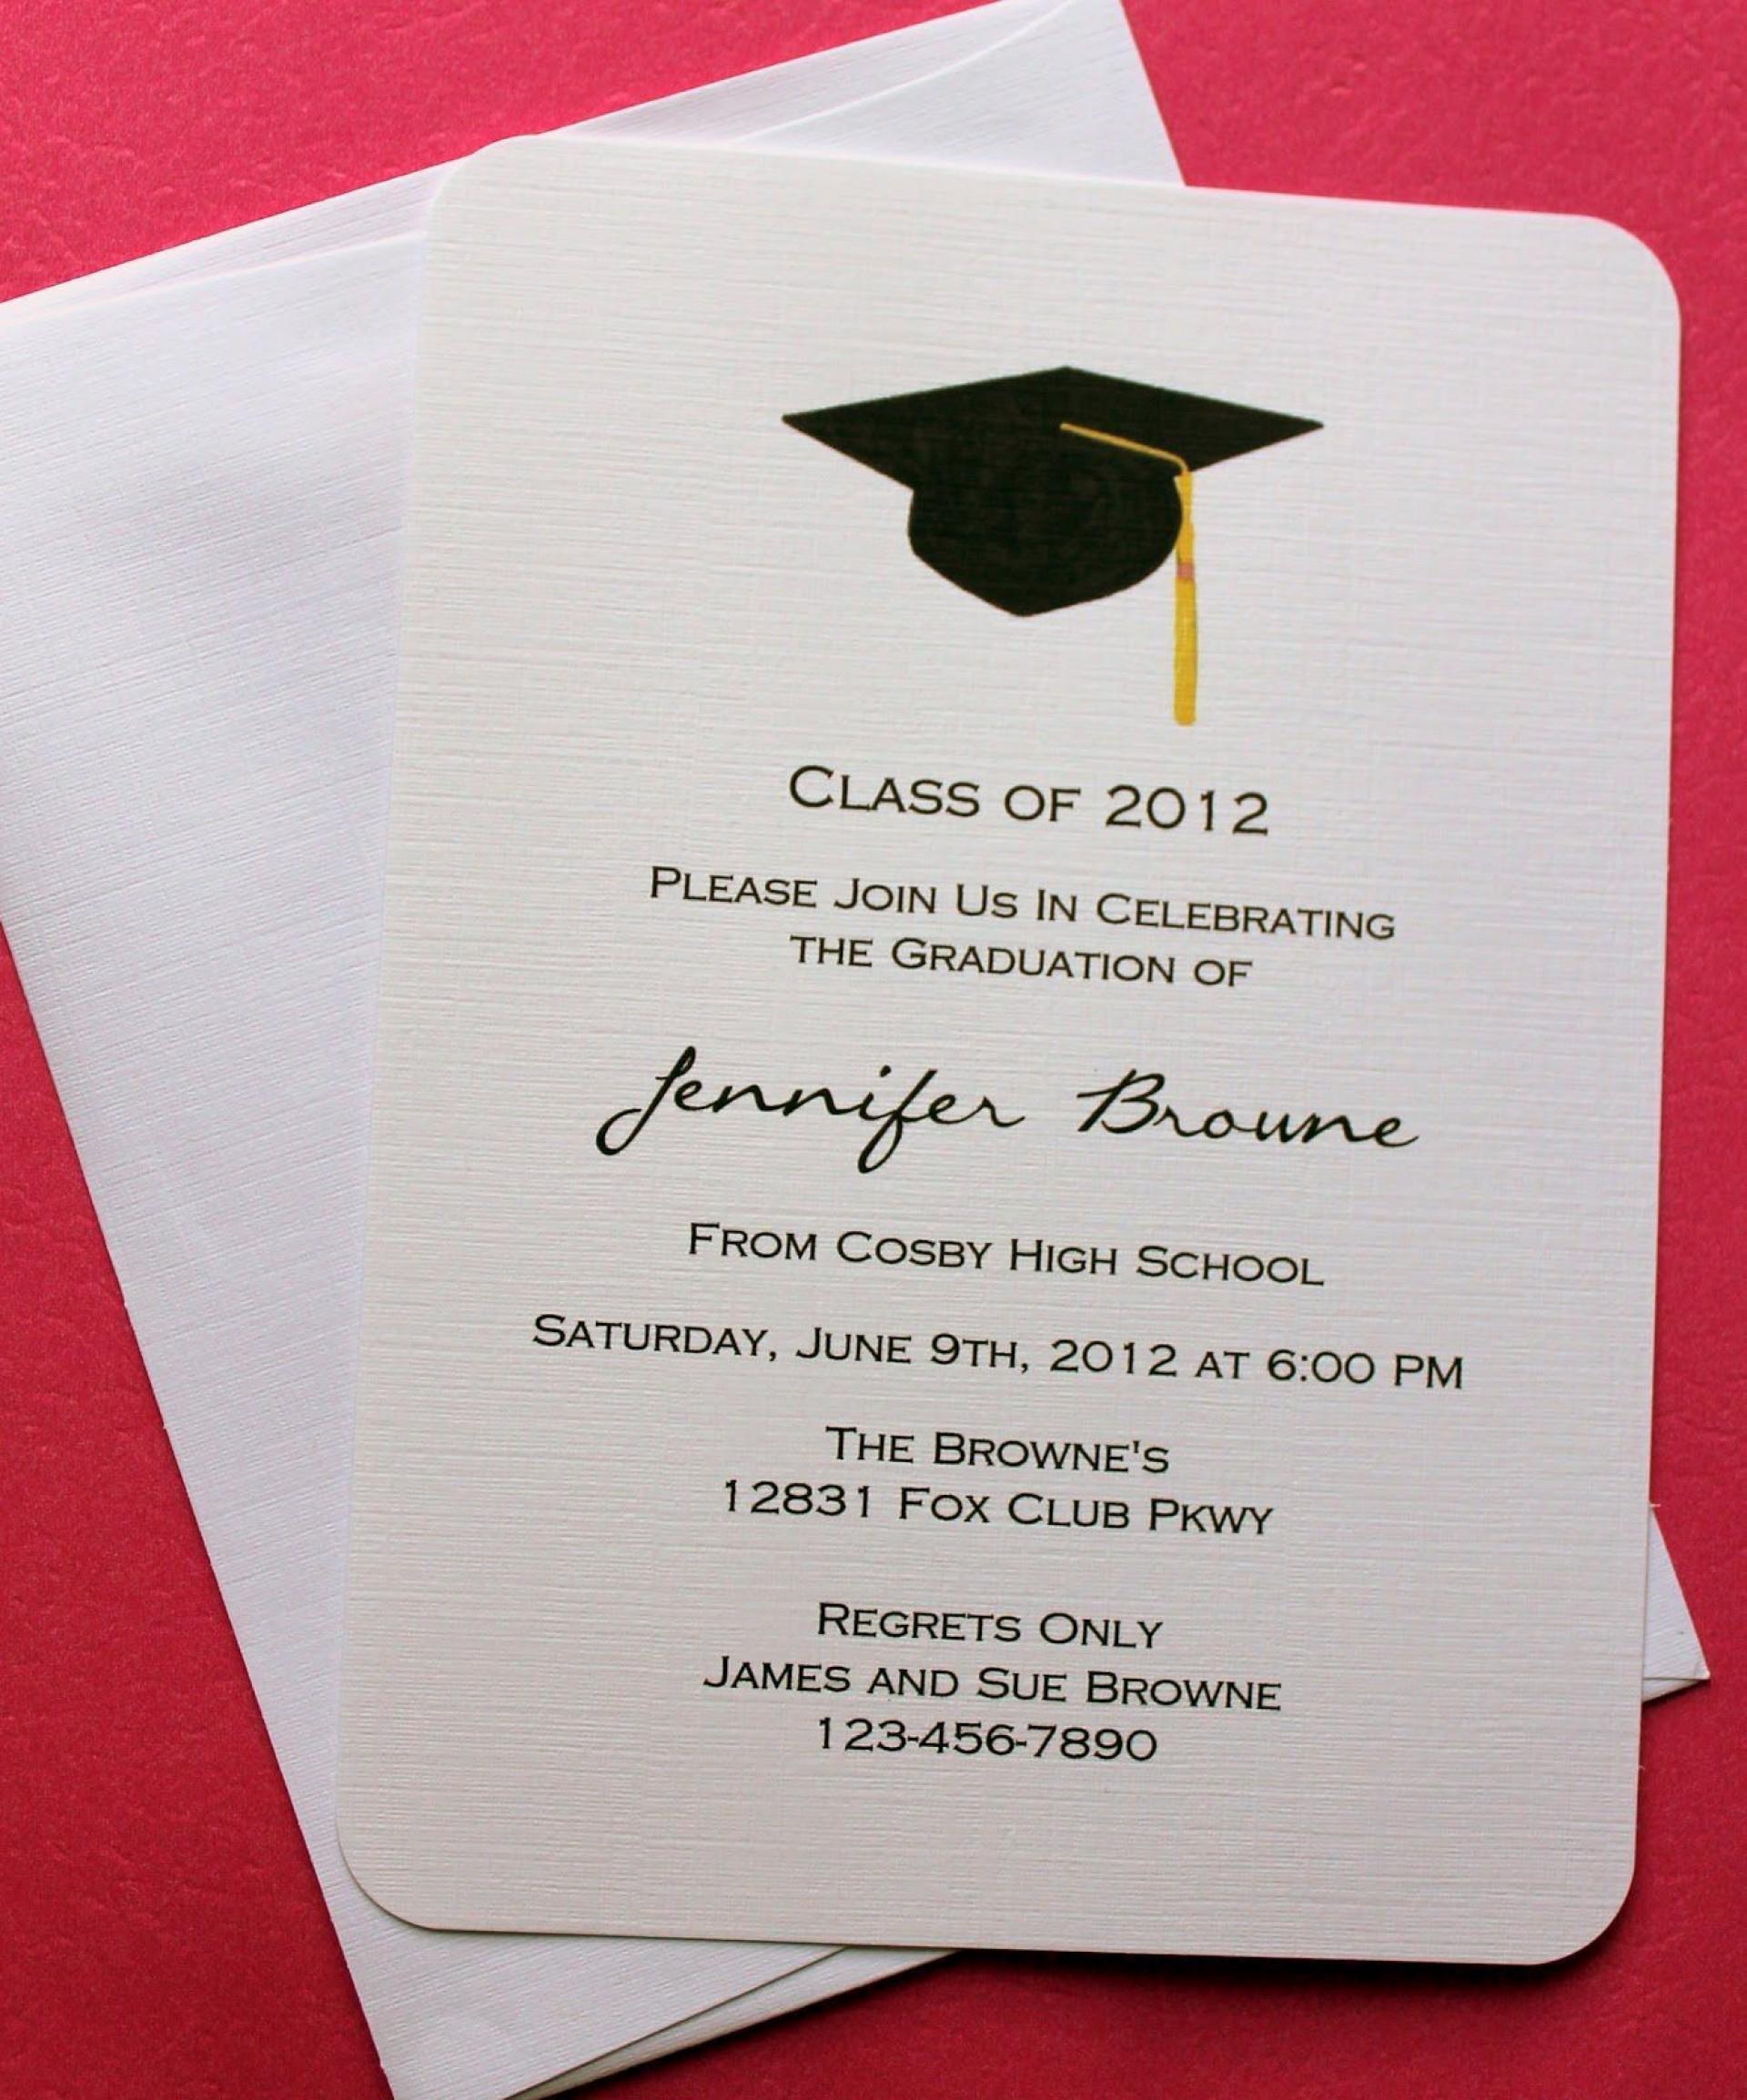 004 Impressive Diy Graduation Announcement Template Free High Resolution  Invitation1920